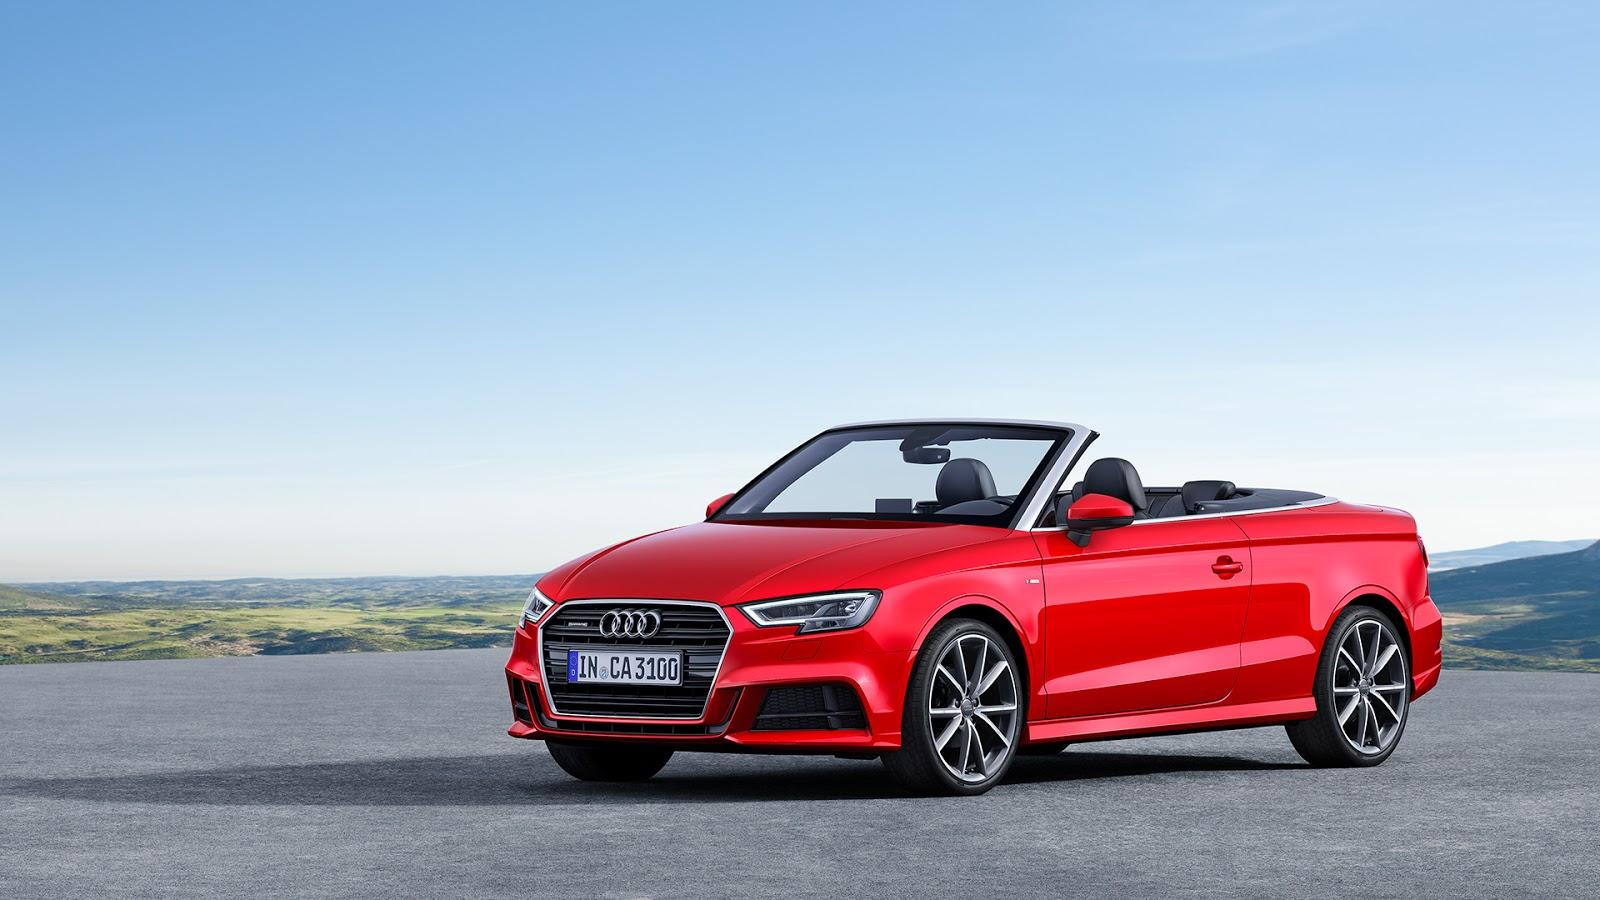 Audi A3 Cabriolet Wheels 2 Car